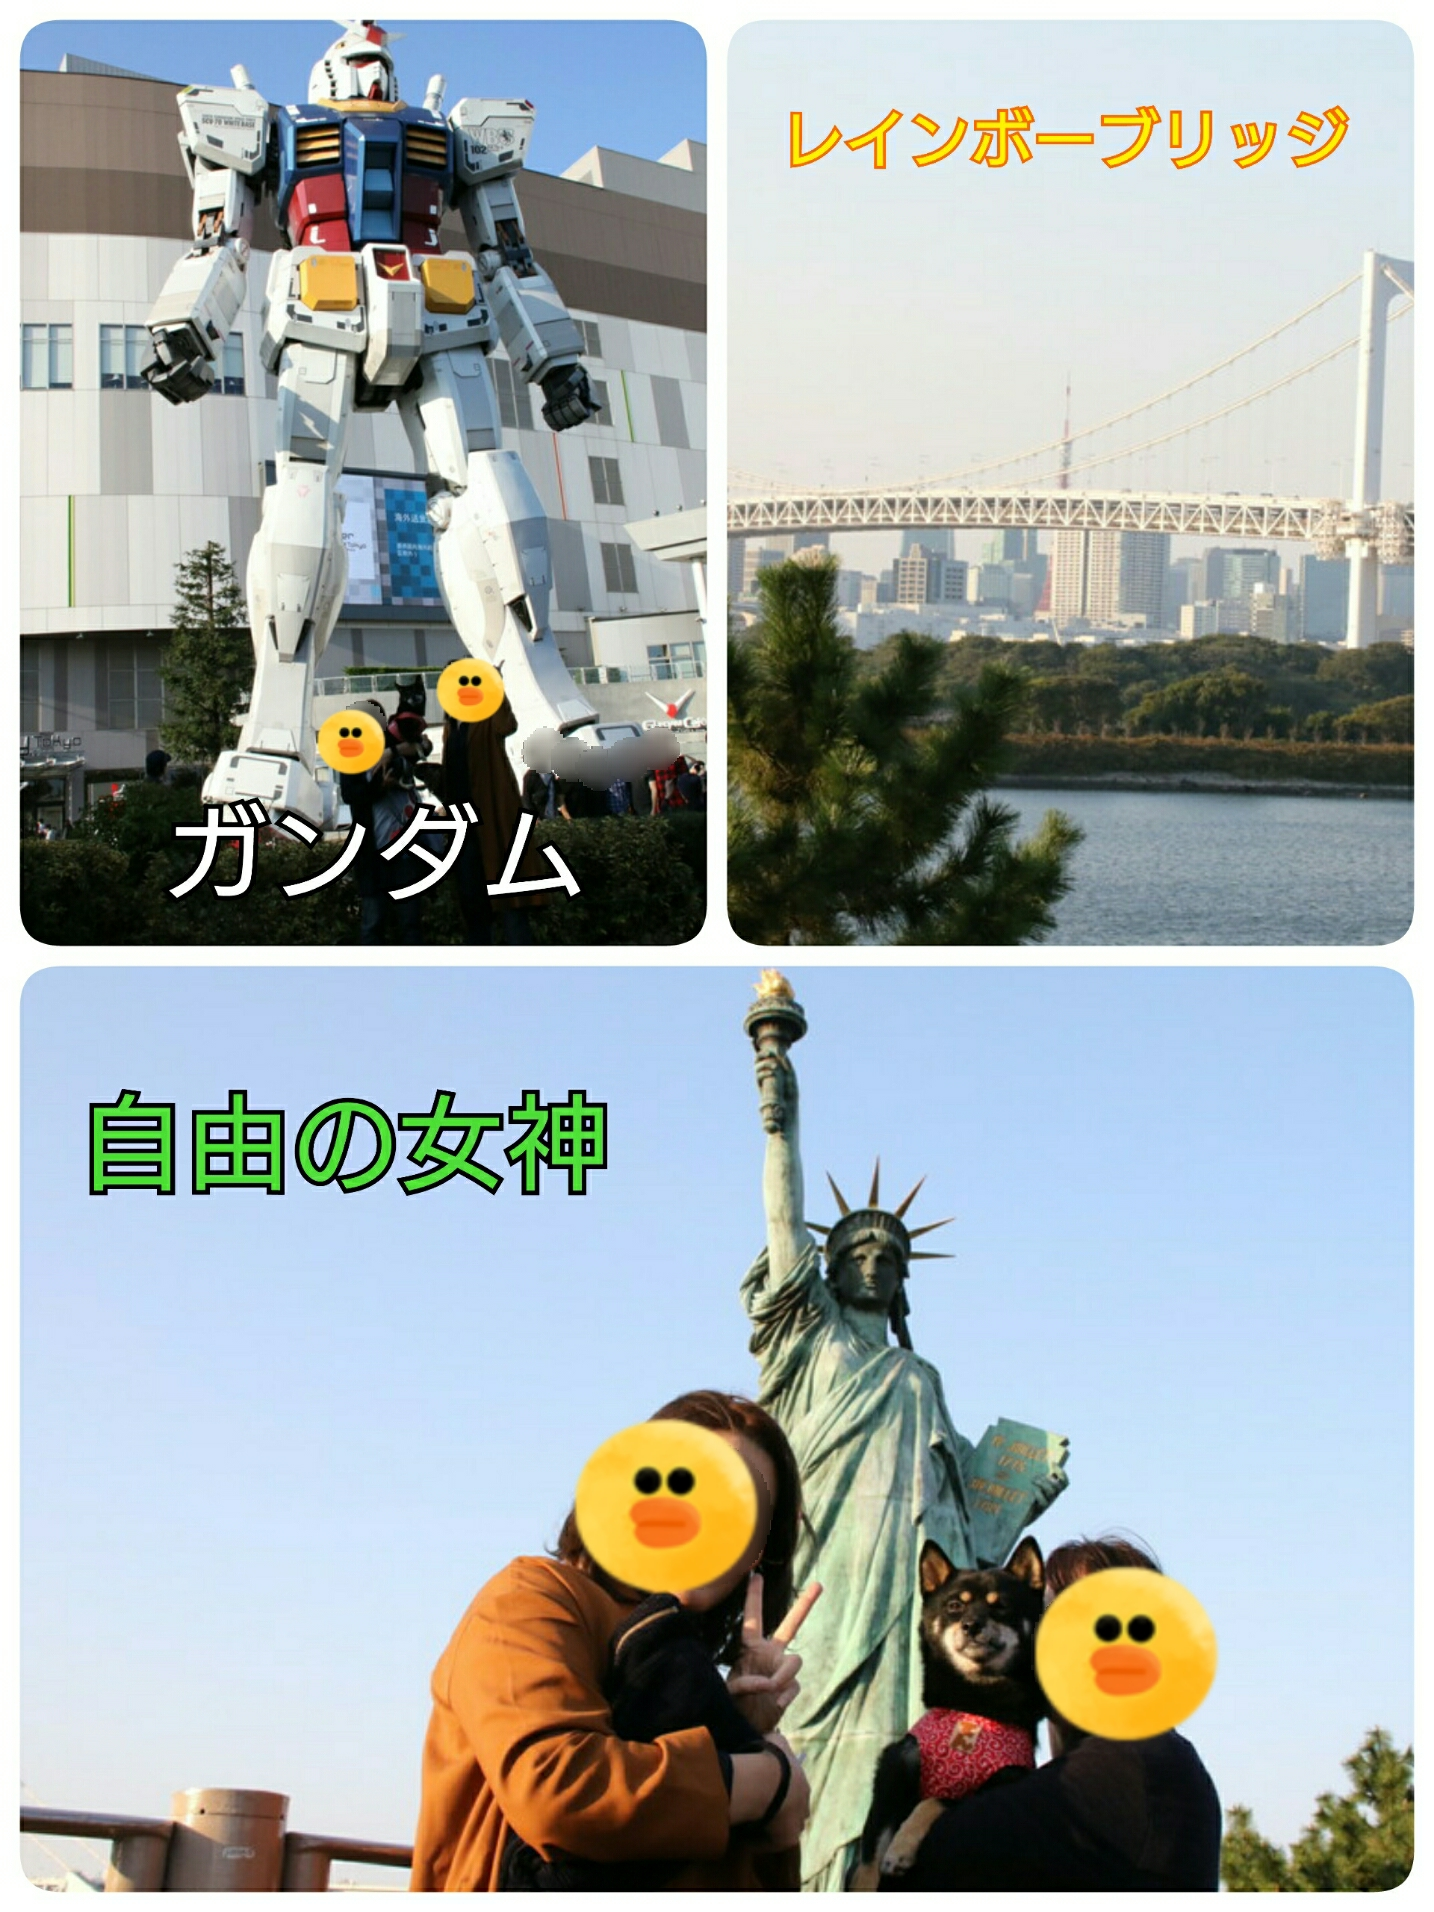 20161117081549dff.jpg